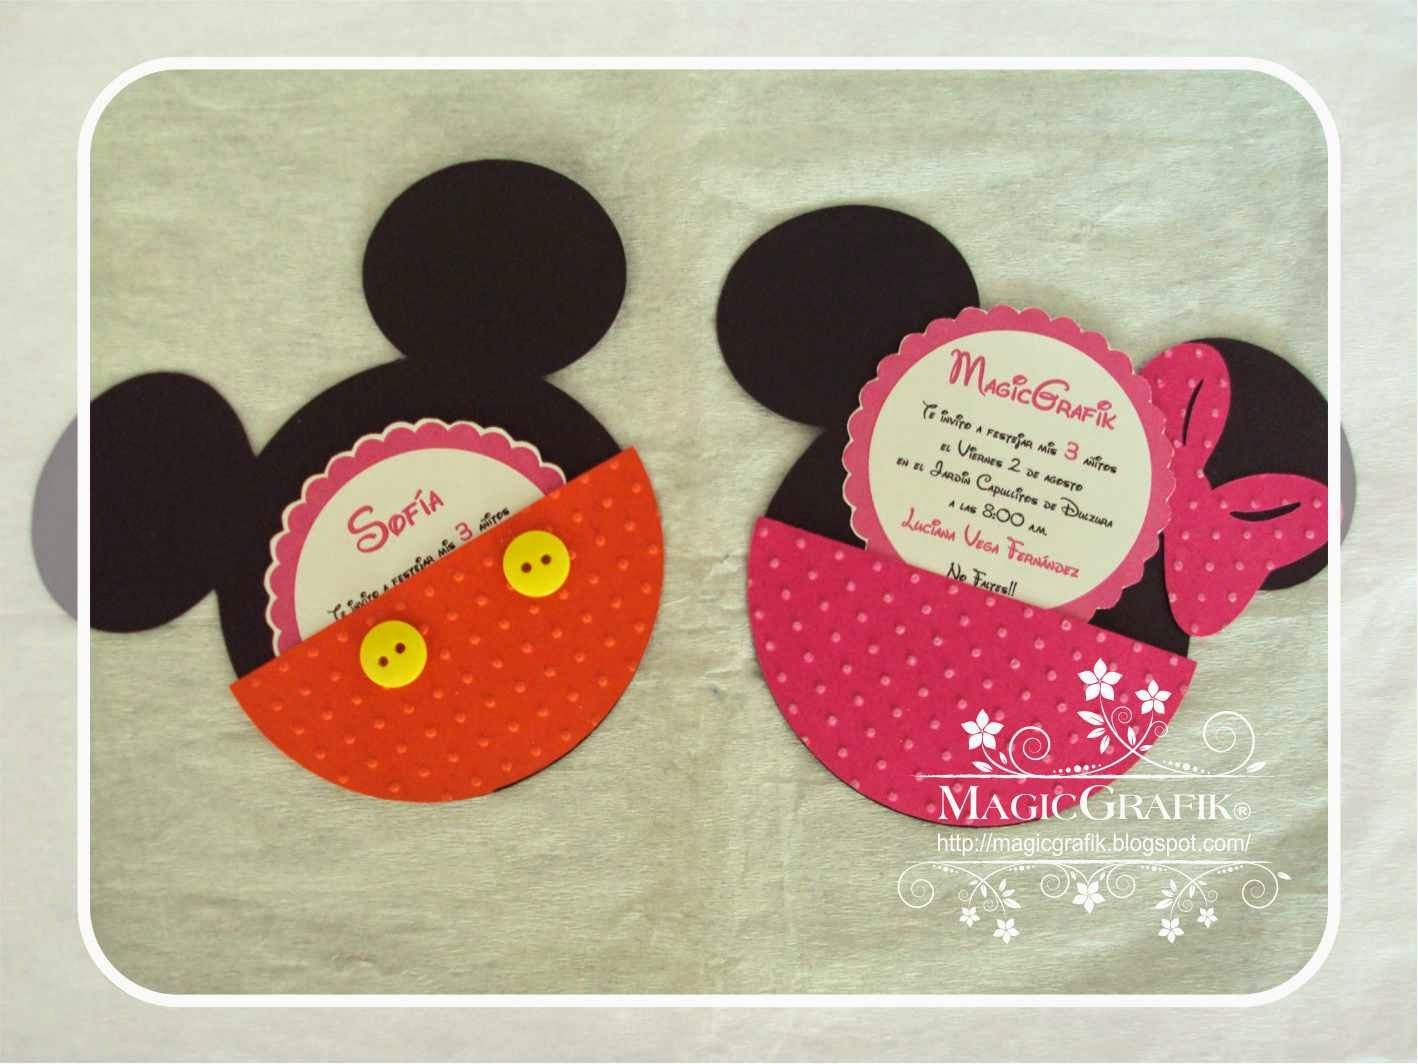 Invitacion cumplea os mickey and minnie invitaciones - Cumpleanos minnie mouse ...